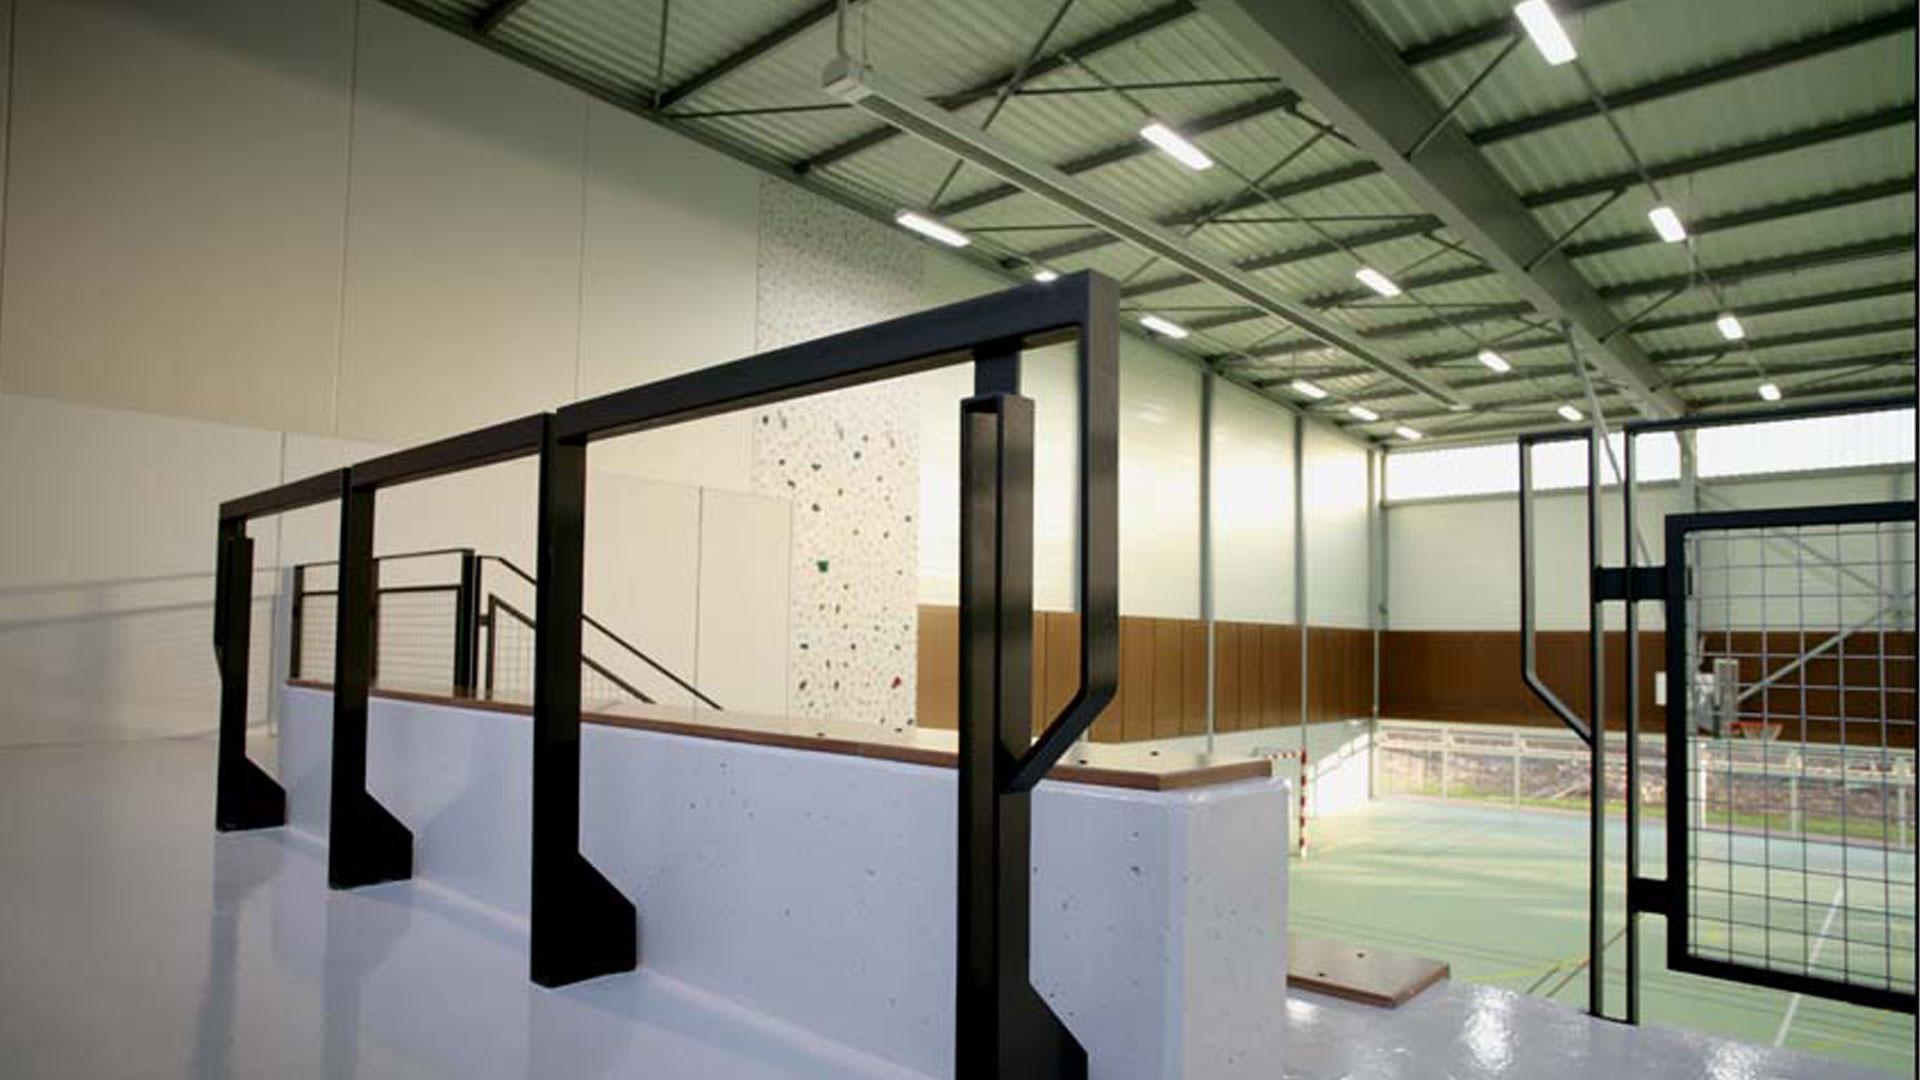 centre culturel et sportif de Dinsheim-sur-Bruche - Gresswiller - photo F.Kronenberger